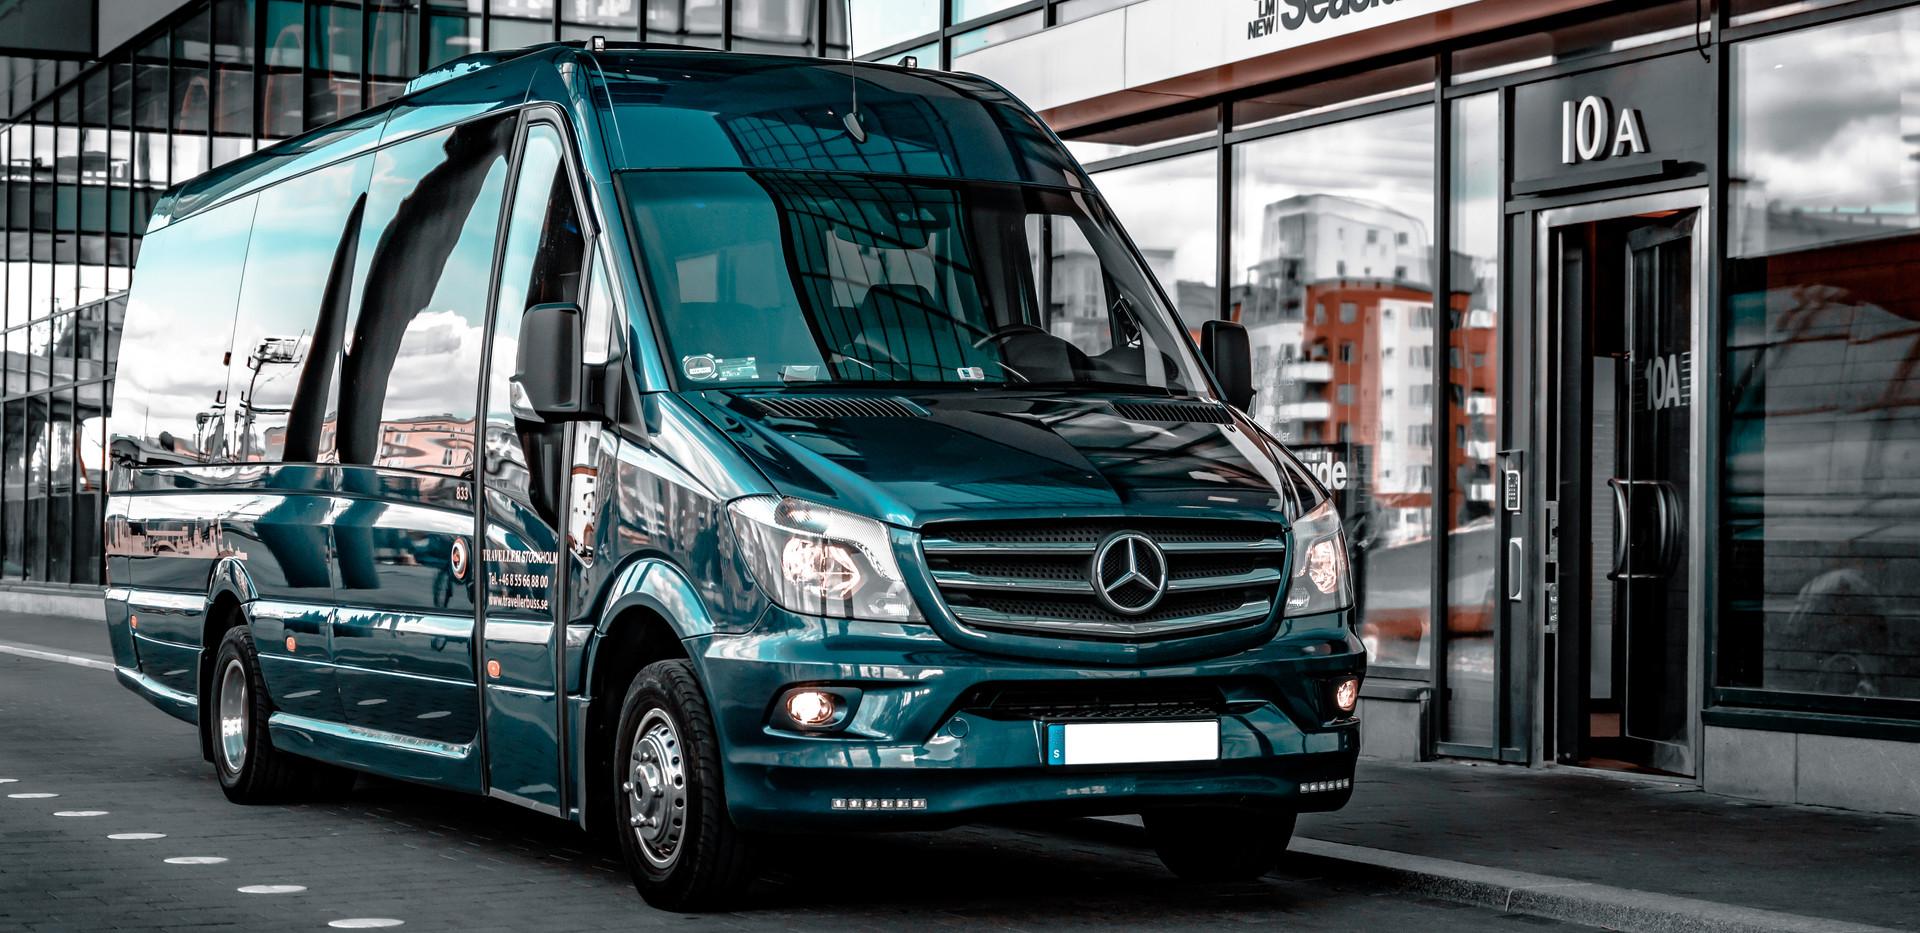 Private Chauffure - Mr Charles - Mercedes Sprinter Bus